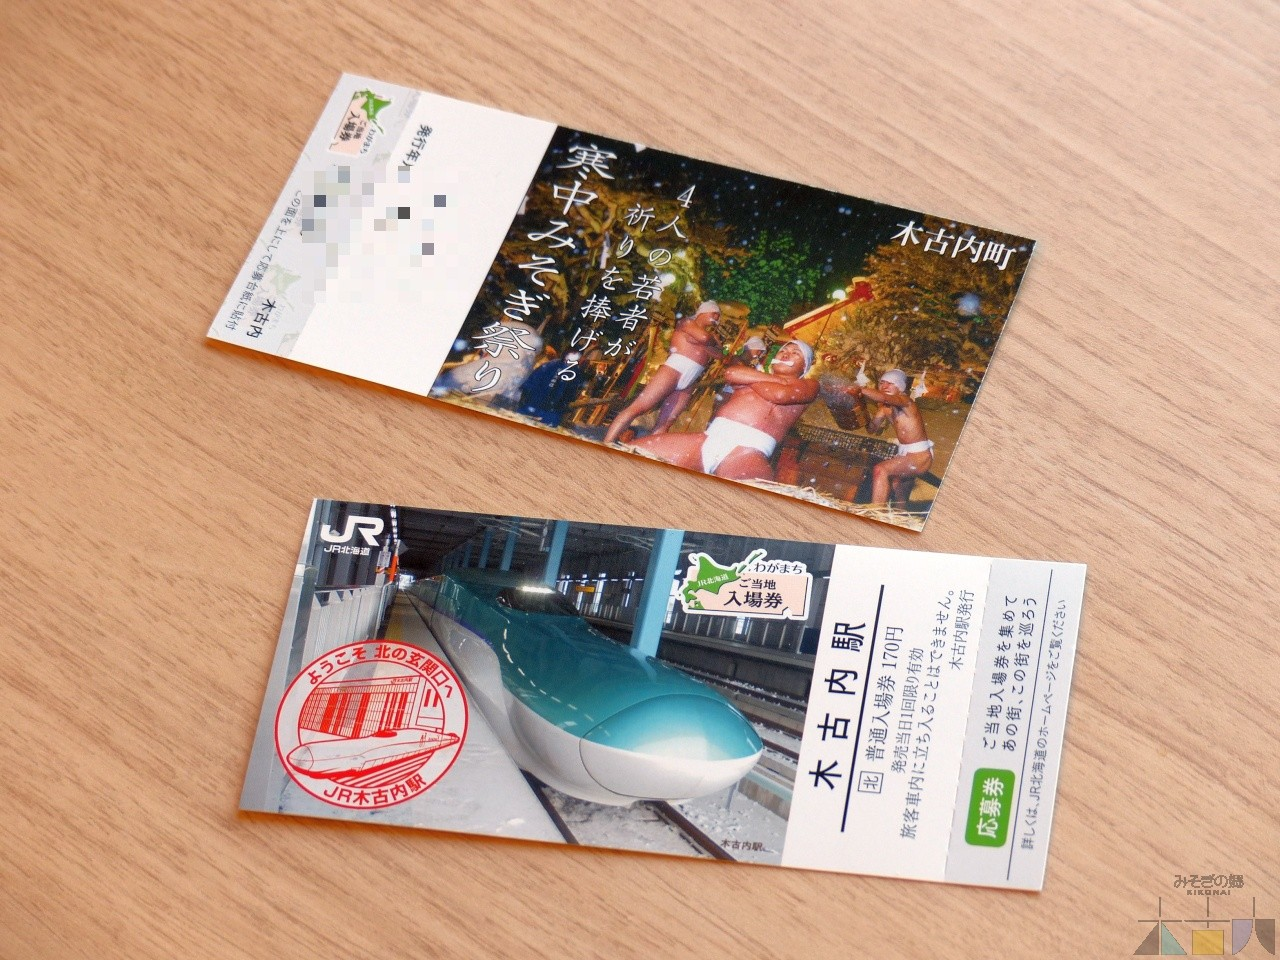 JR『わがまちご当地入場券』 木古内らしさ満点のデザイン!